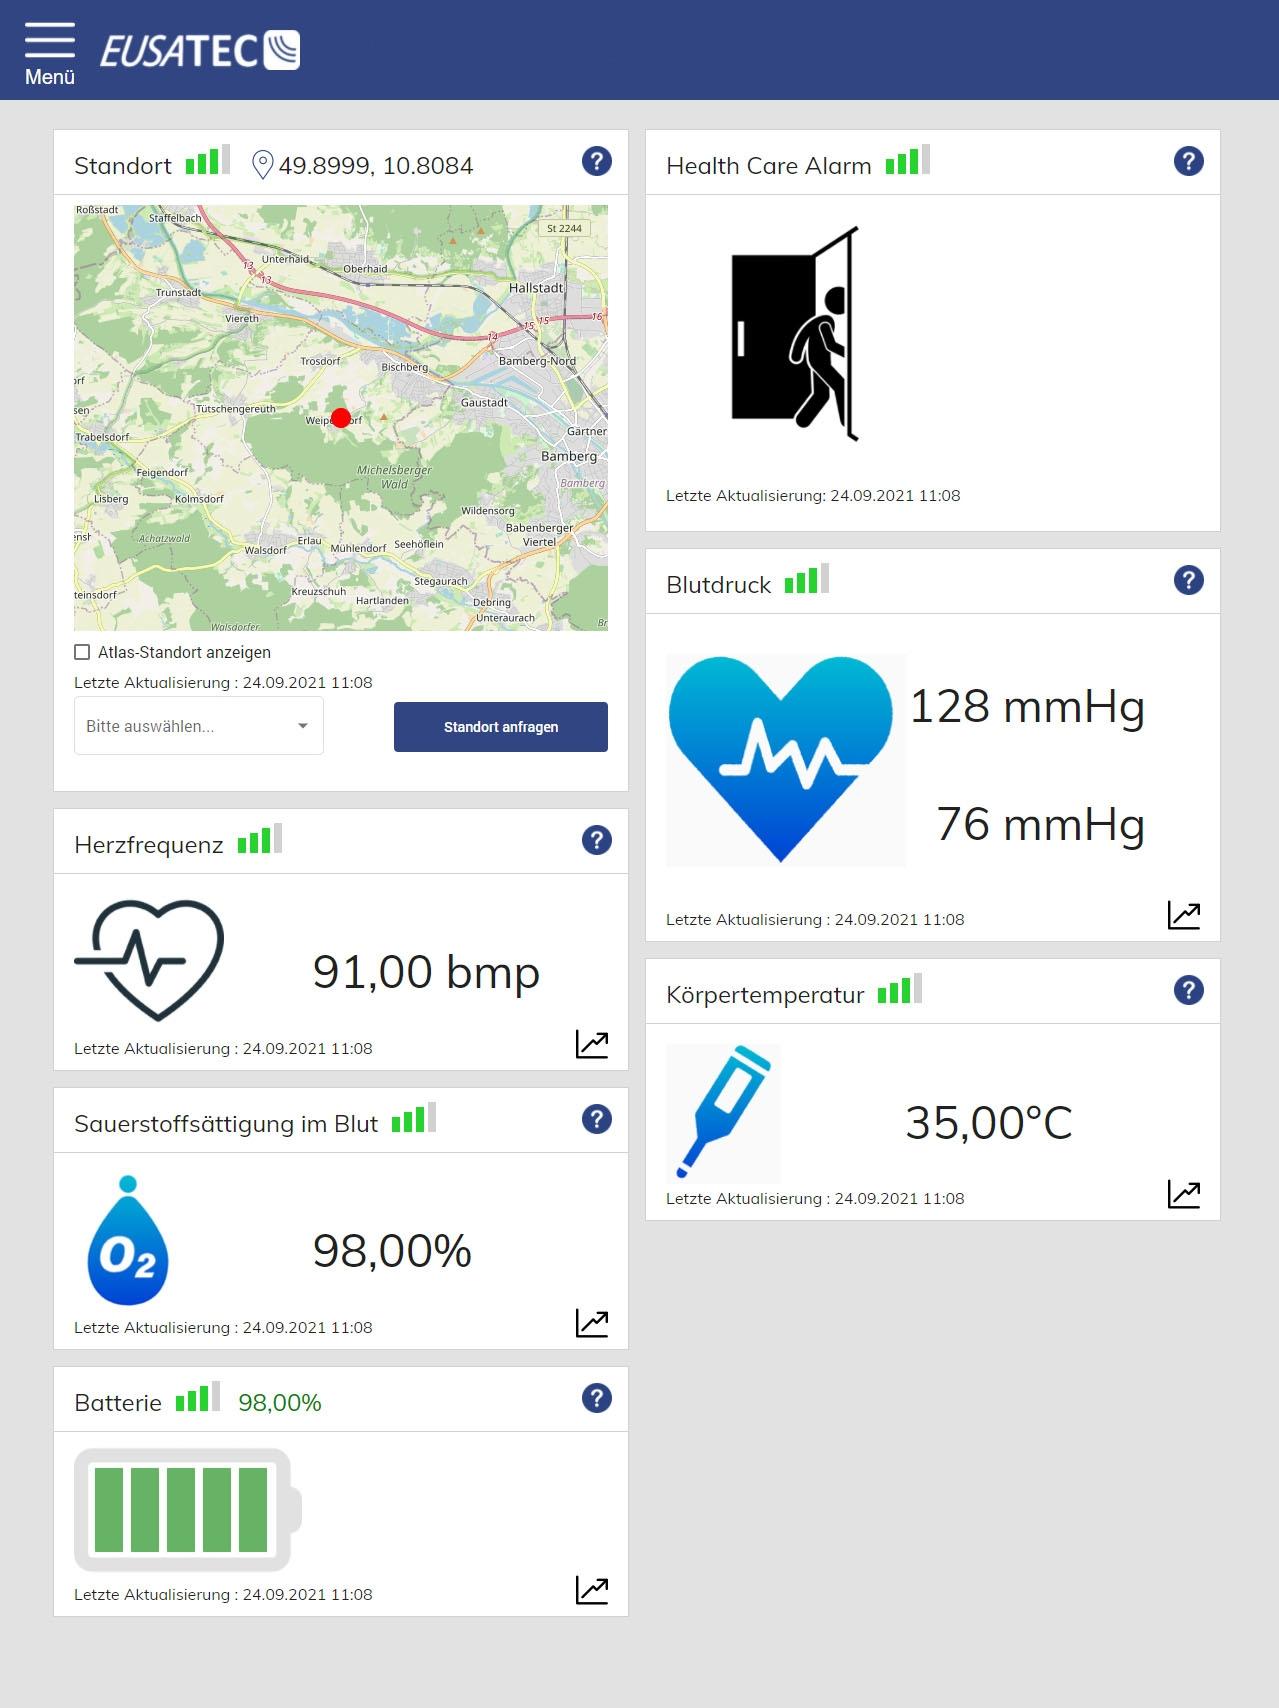 EUSATEC HealthCare Monitoring